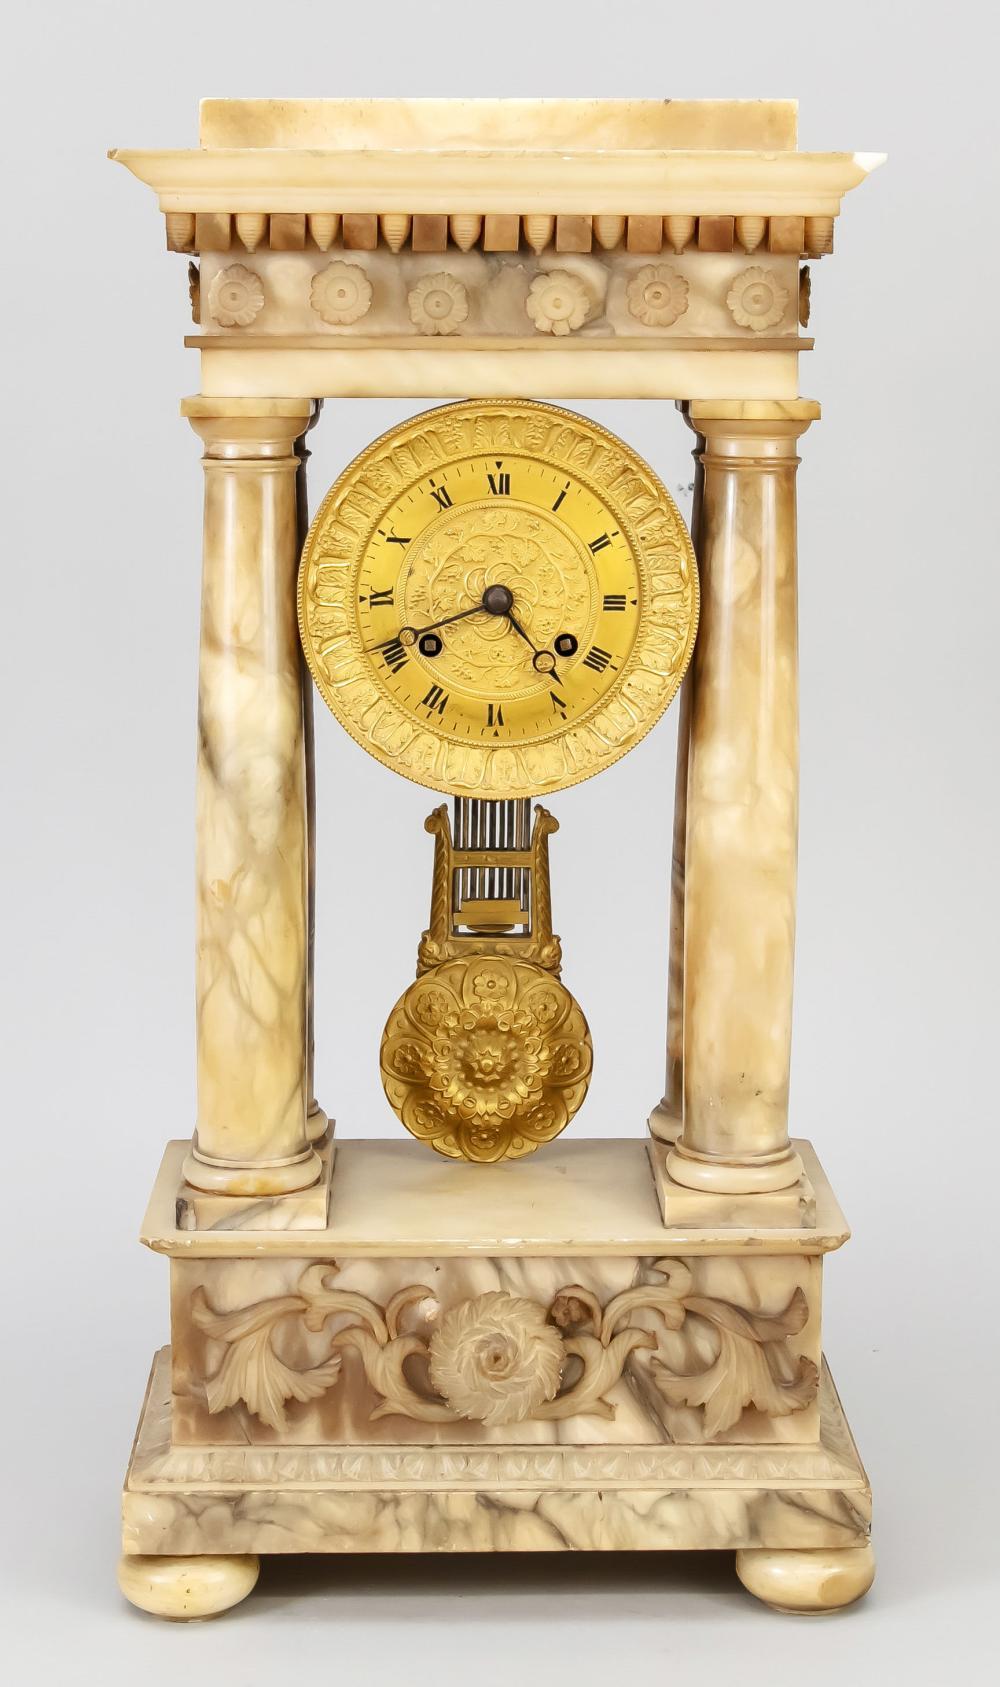 Portal clock, 2nd half of the